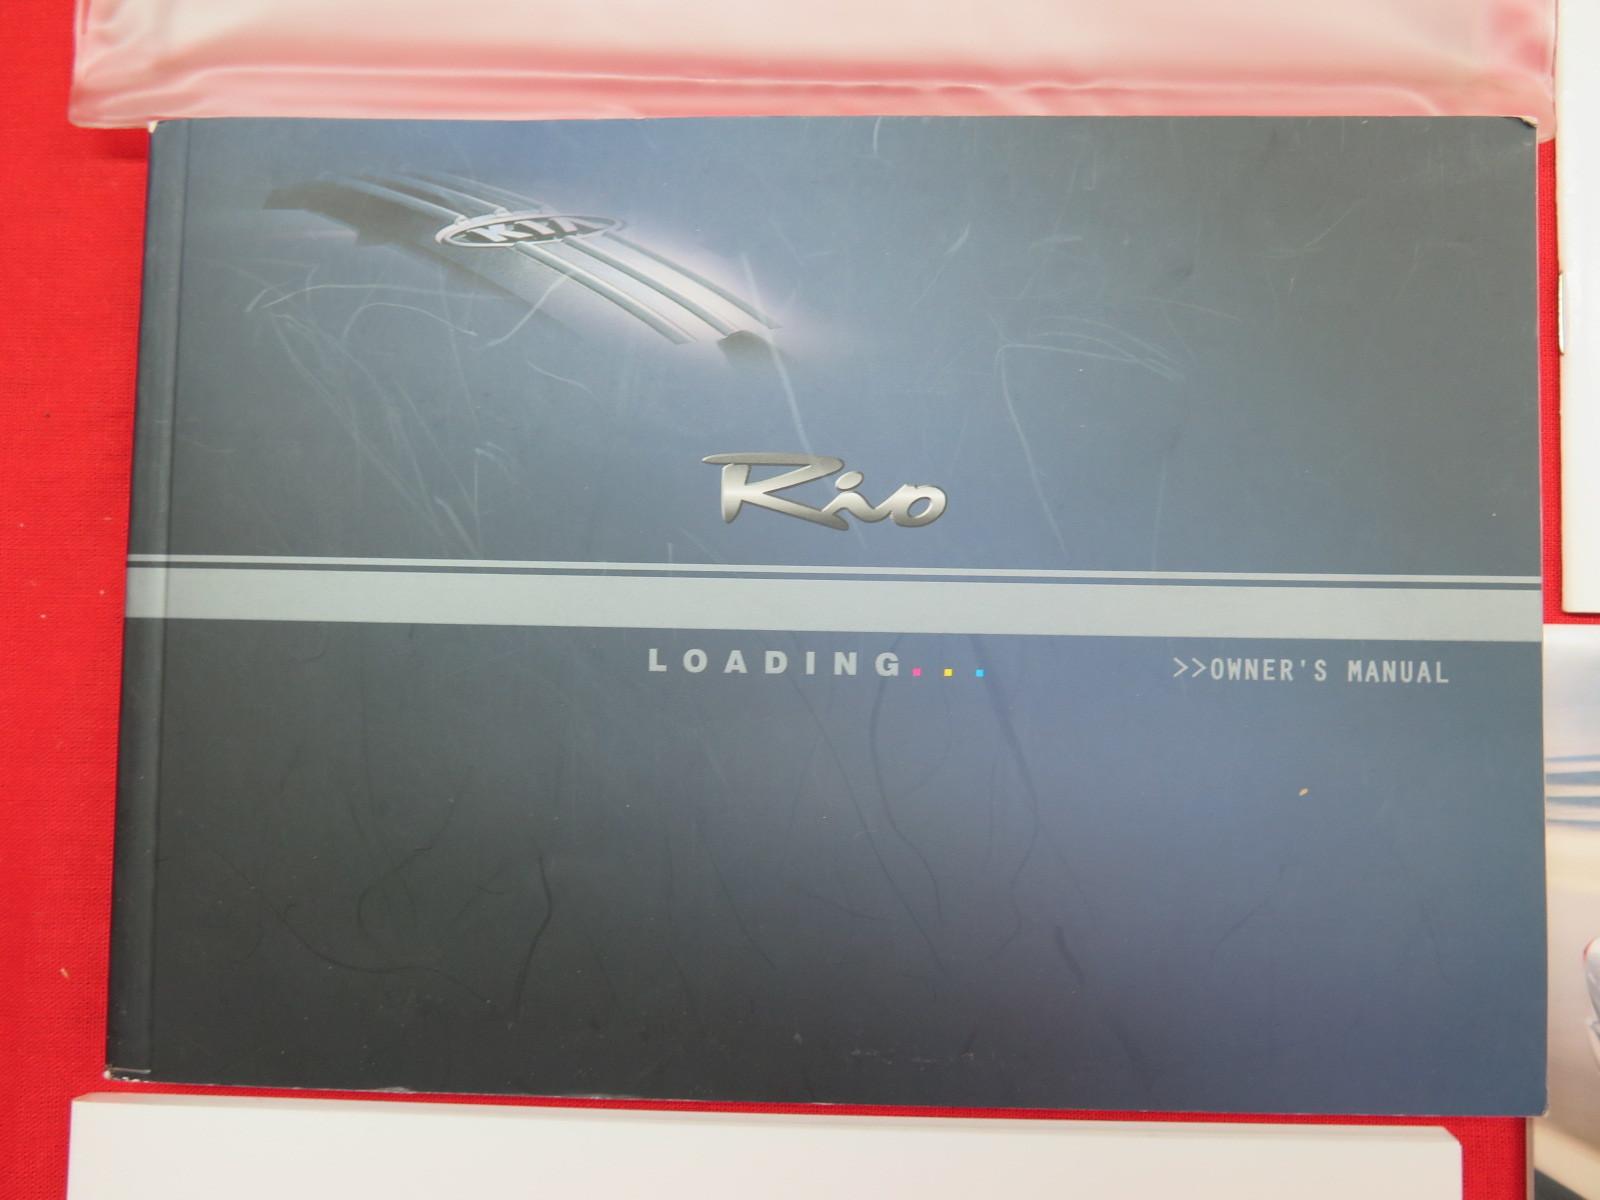 2005 kia rio owners manual pdf